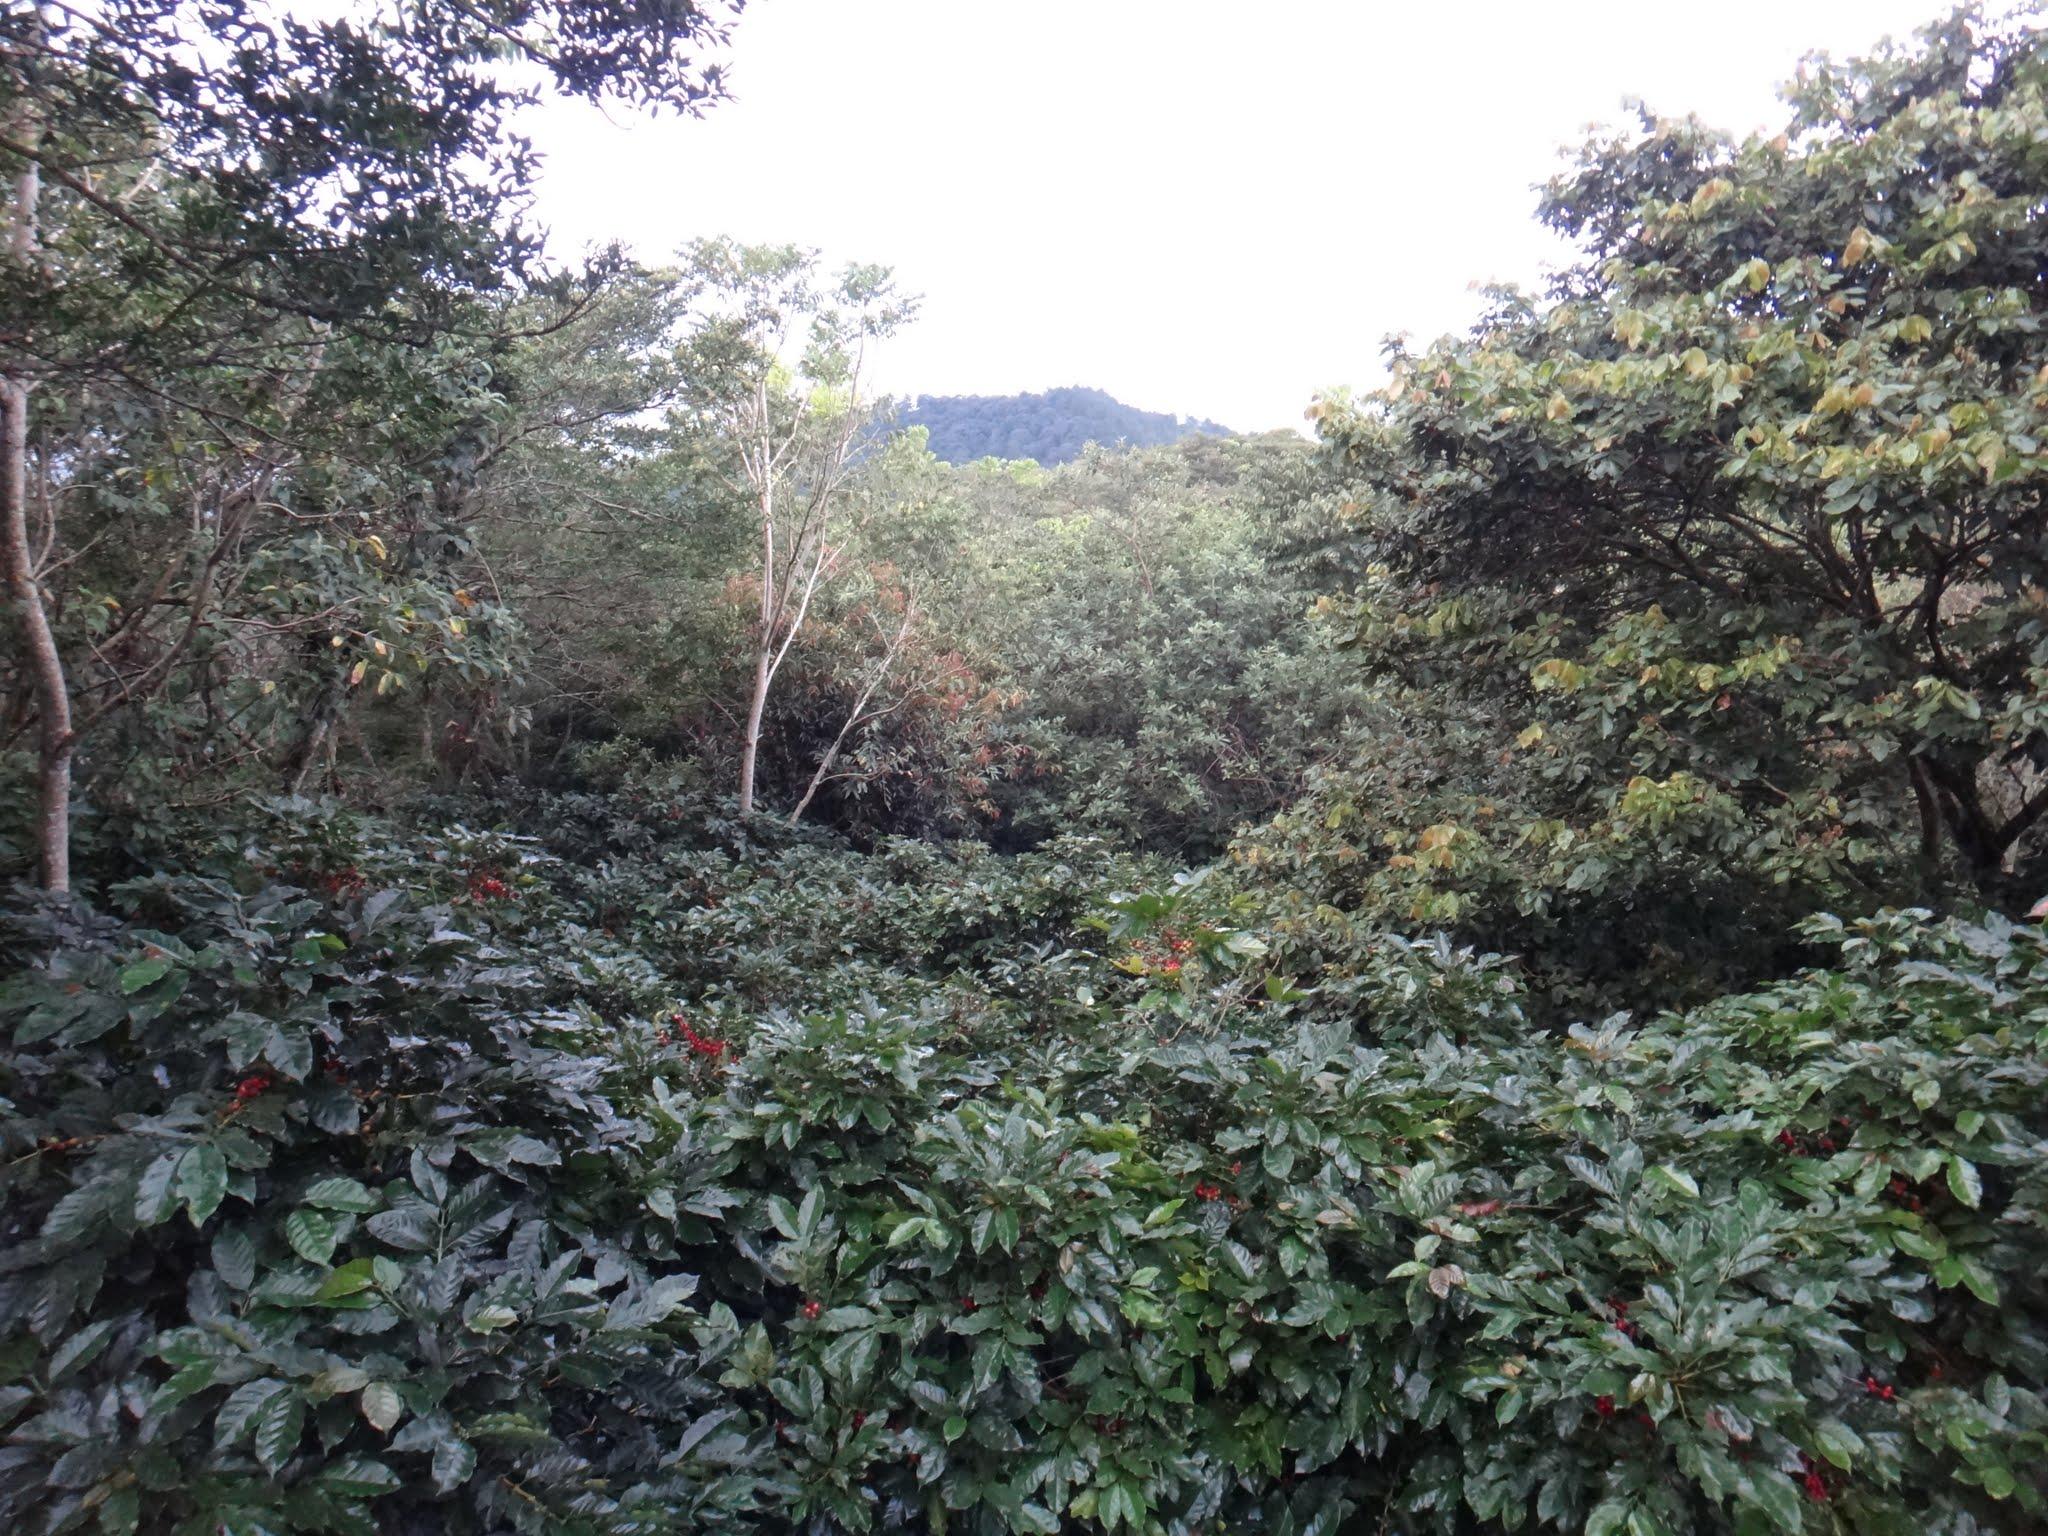 flor-del-pino-honduras-fairtrade-coffee-59